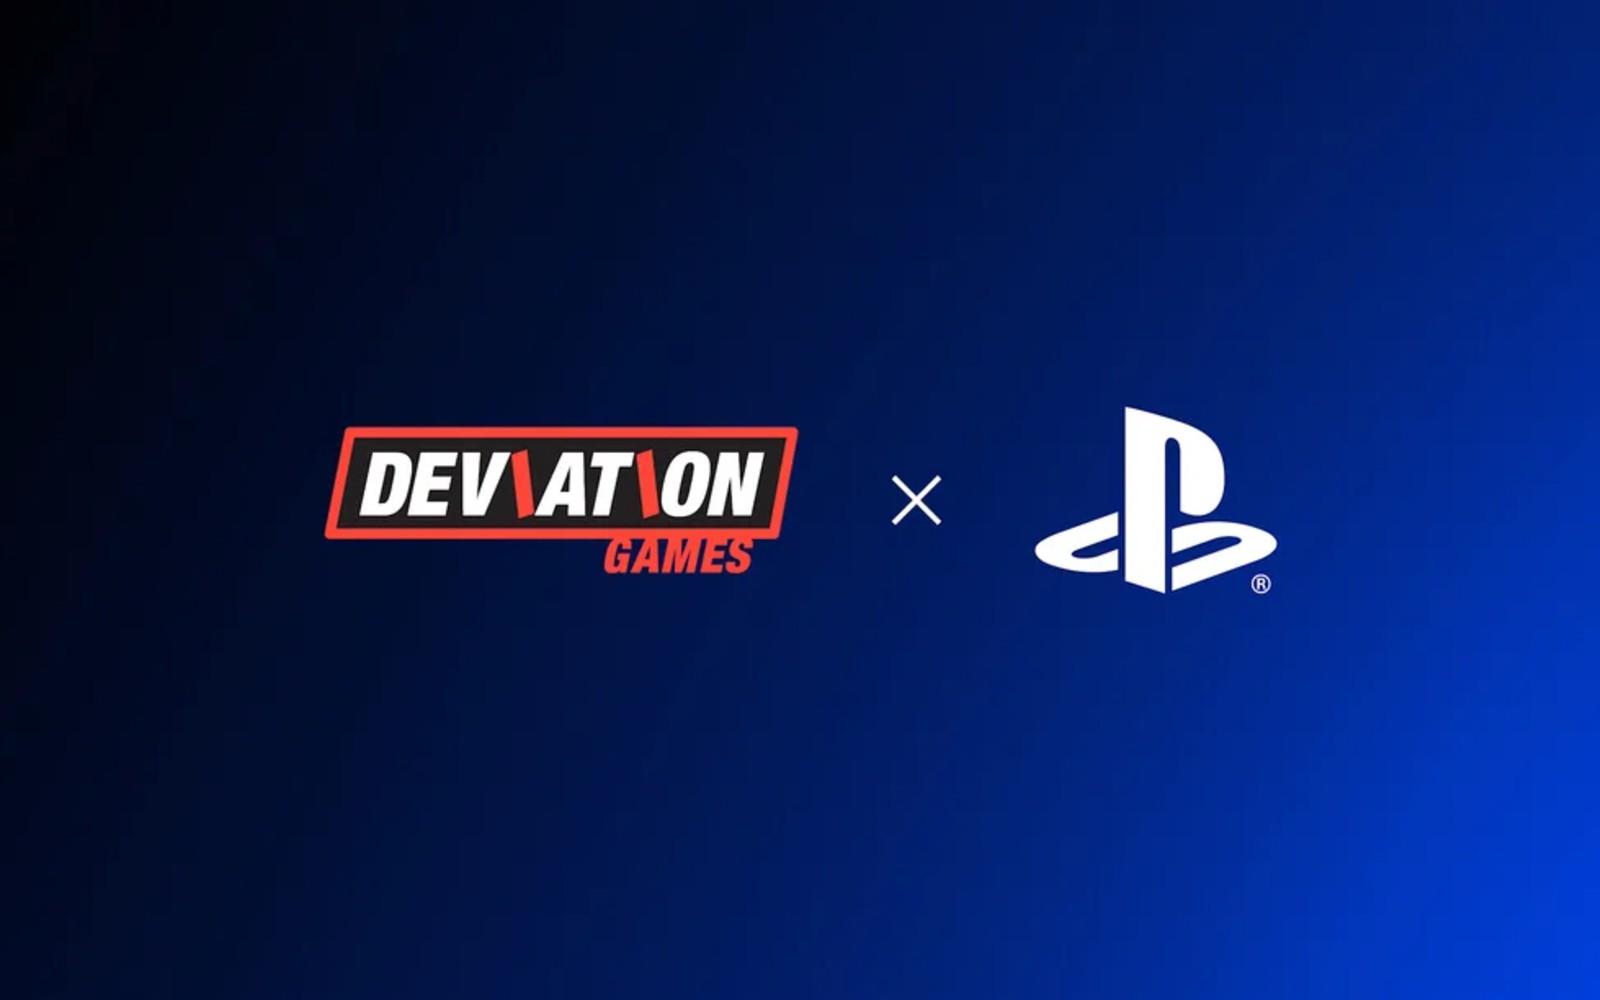 Deviation-games-partnership